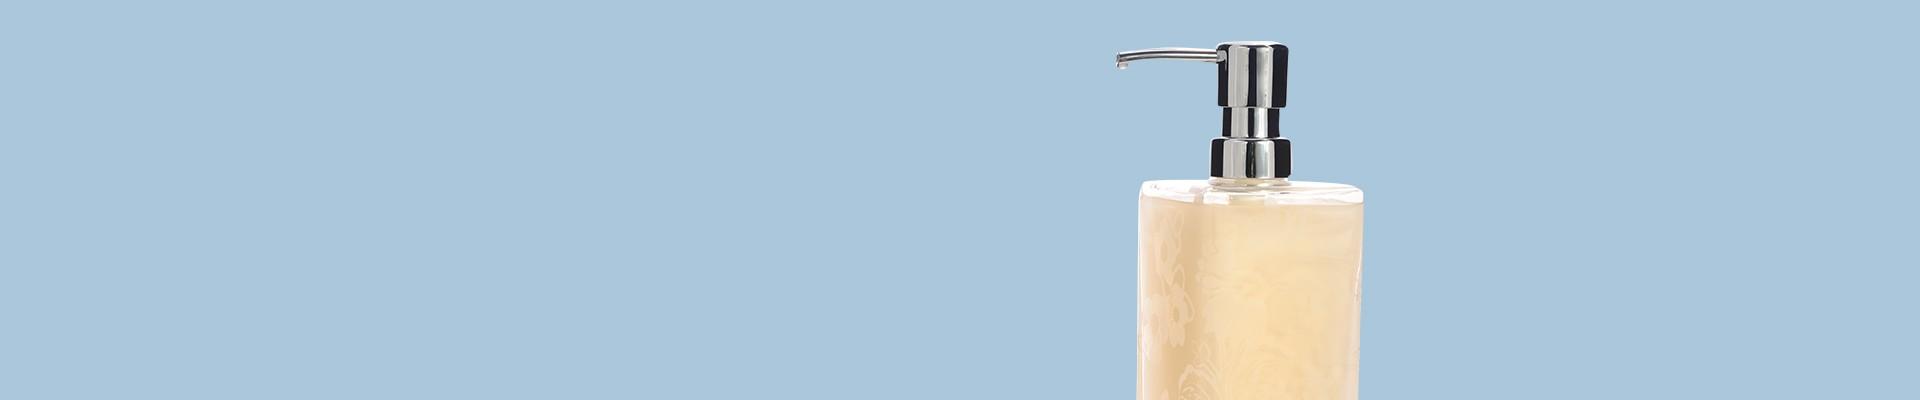 Jual Gantungan Tempat Sabun & Shampoo Kamar Mandi